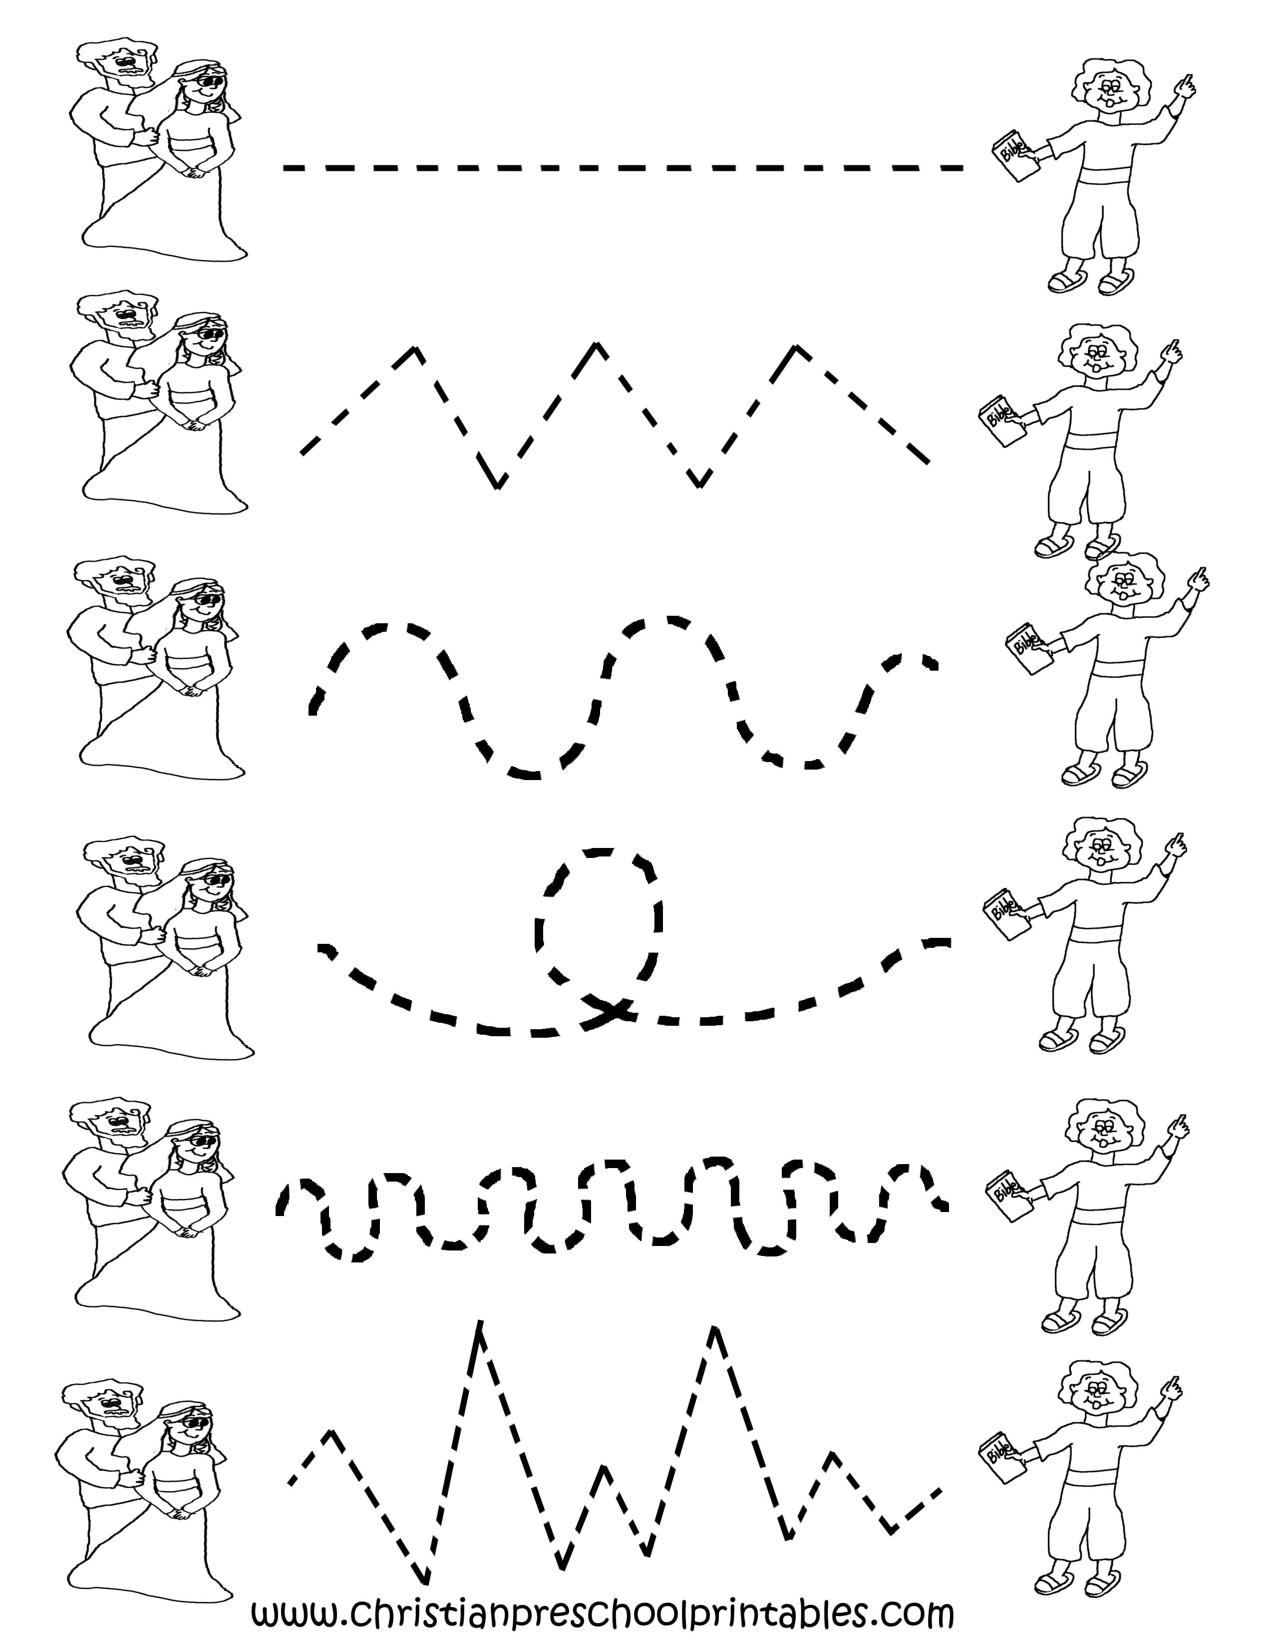 Image Detail For Preschool Tracing Worksheets